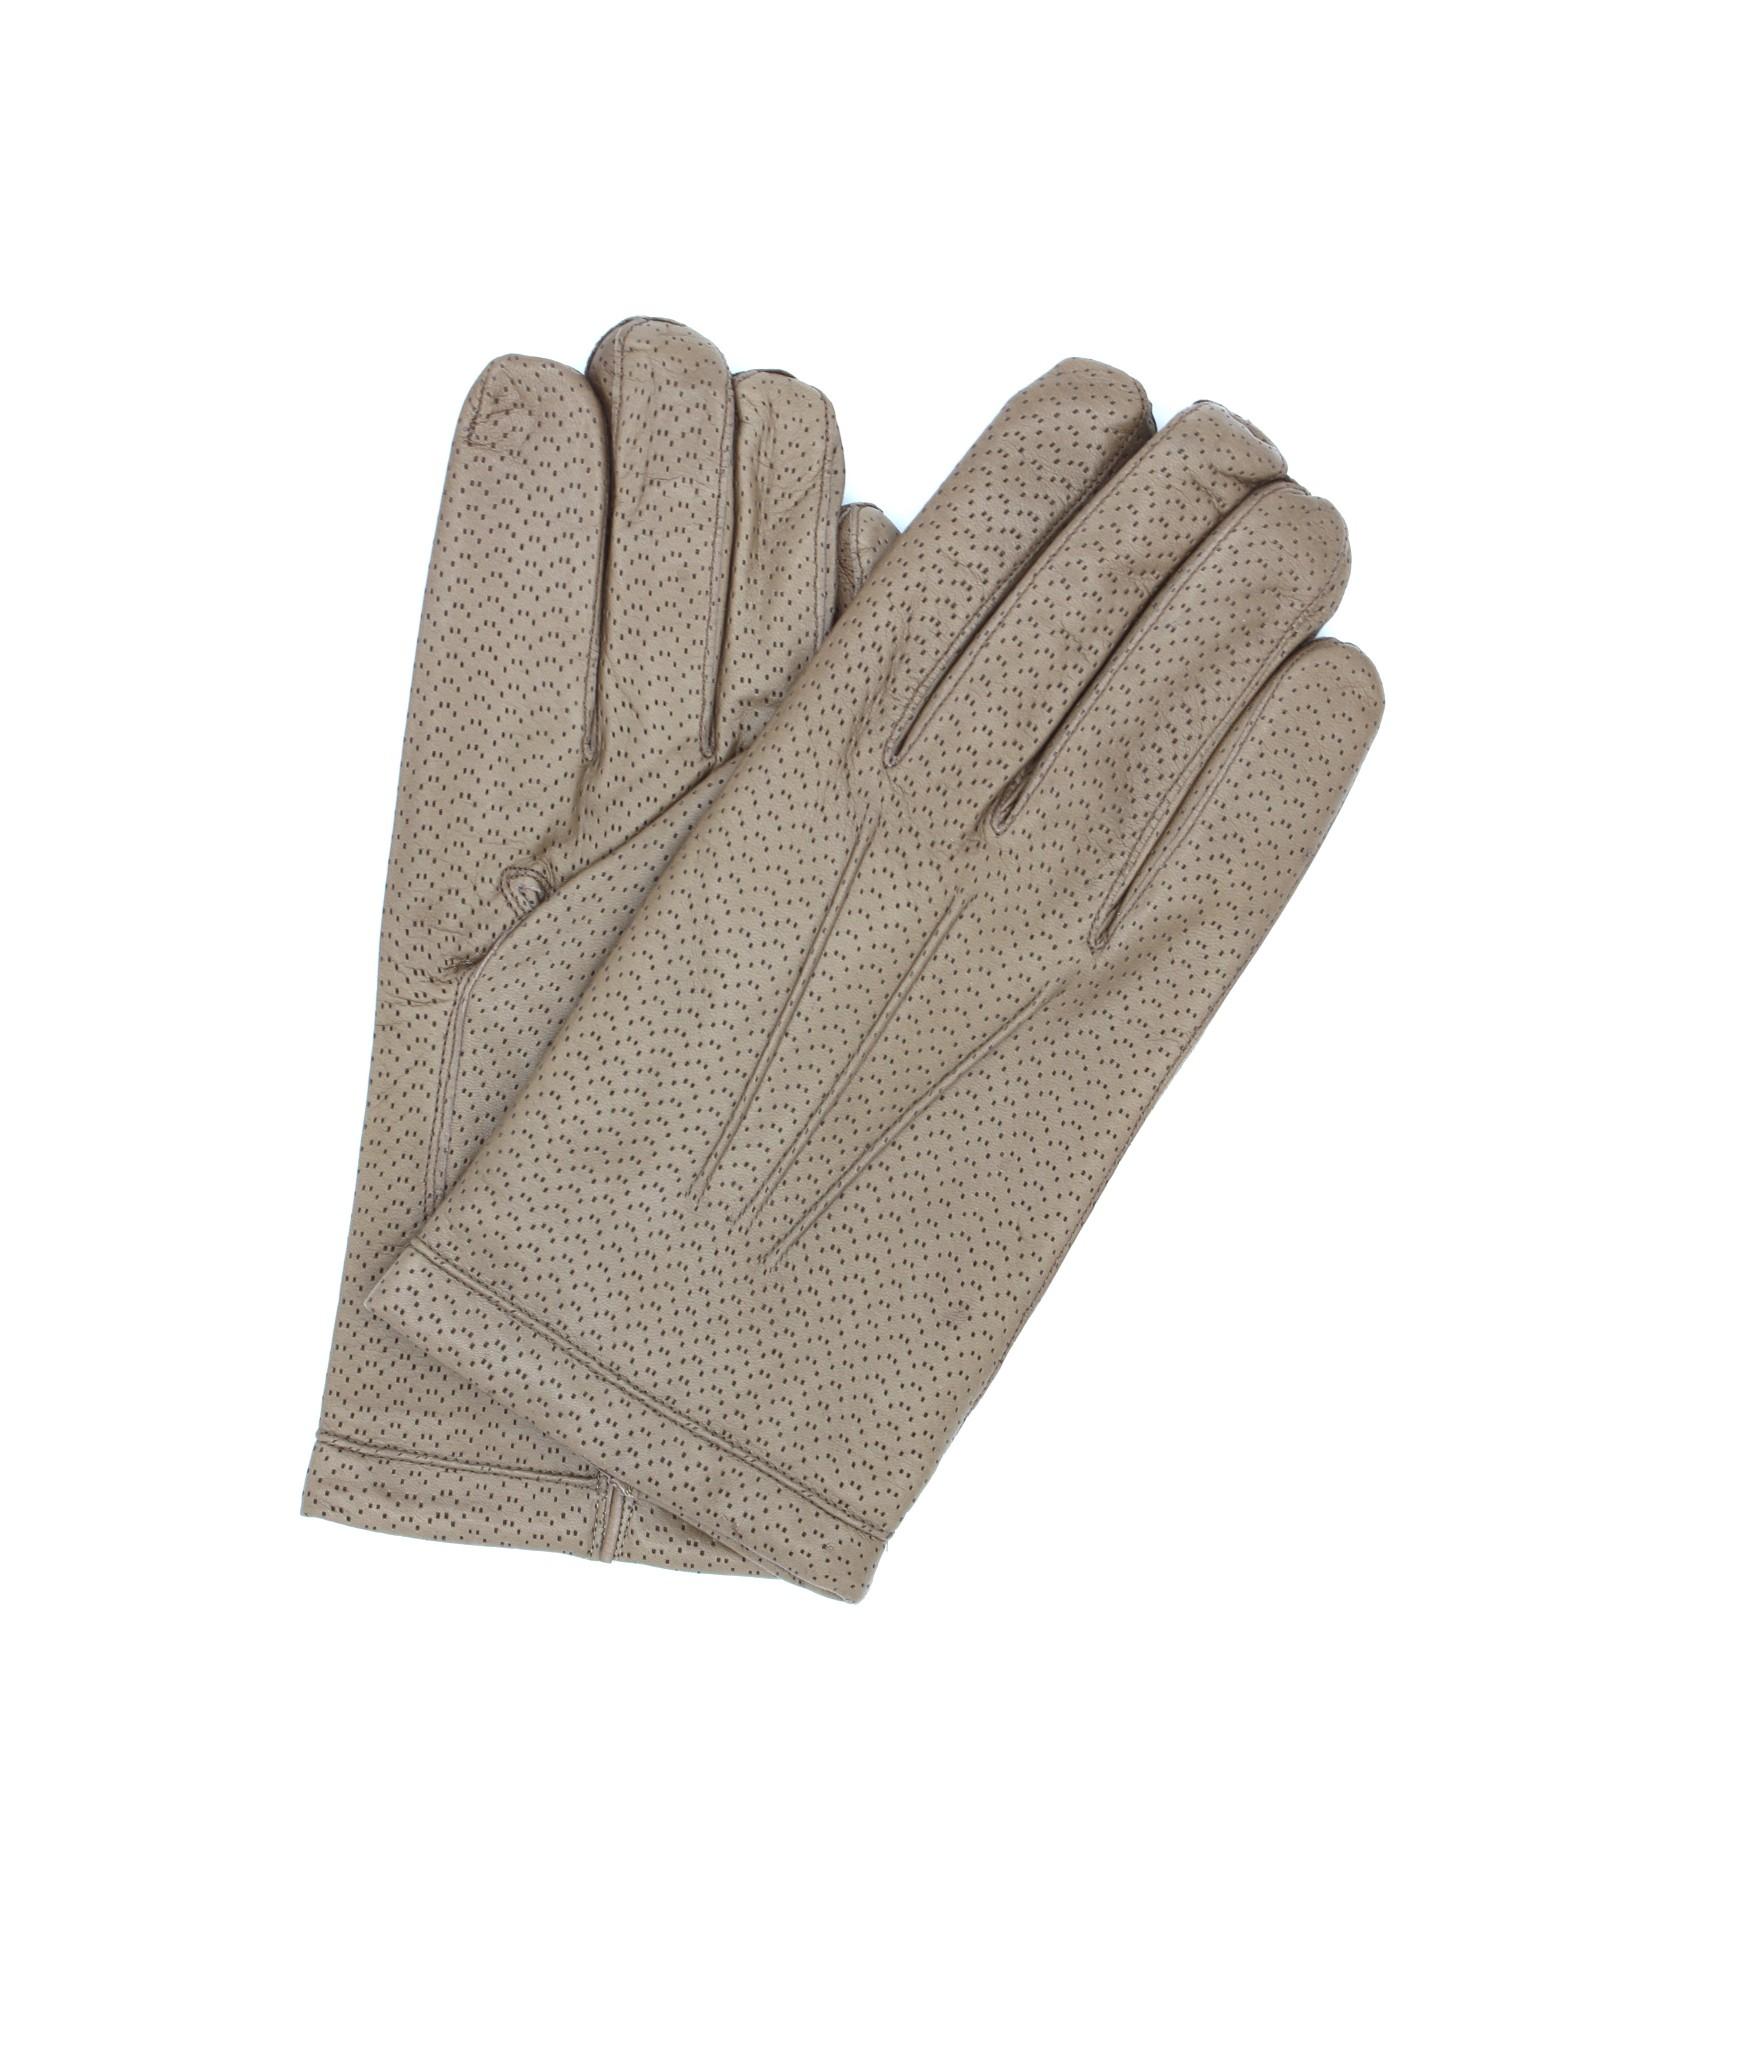 Nappa leather gloves 2bt cashmere lined Mud Sermoneta Gloves